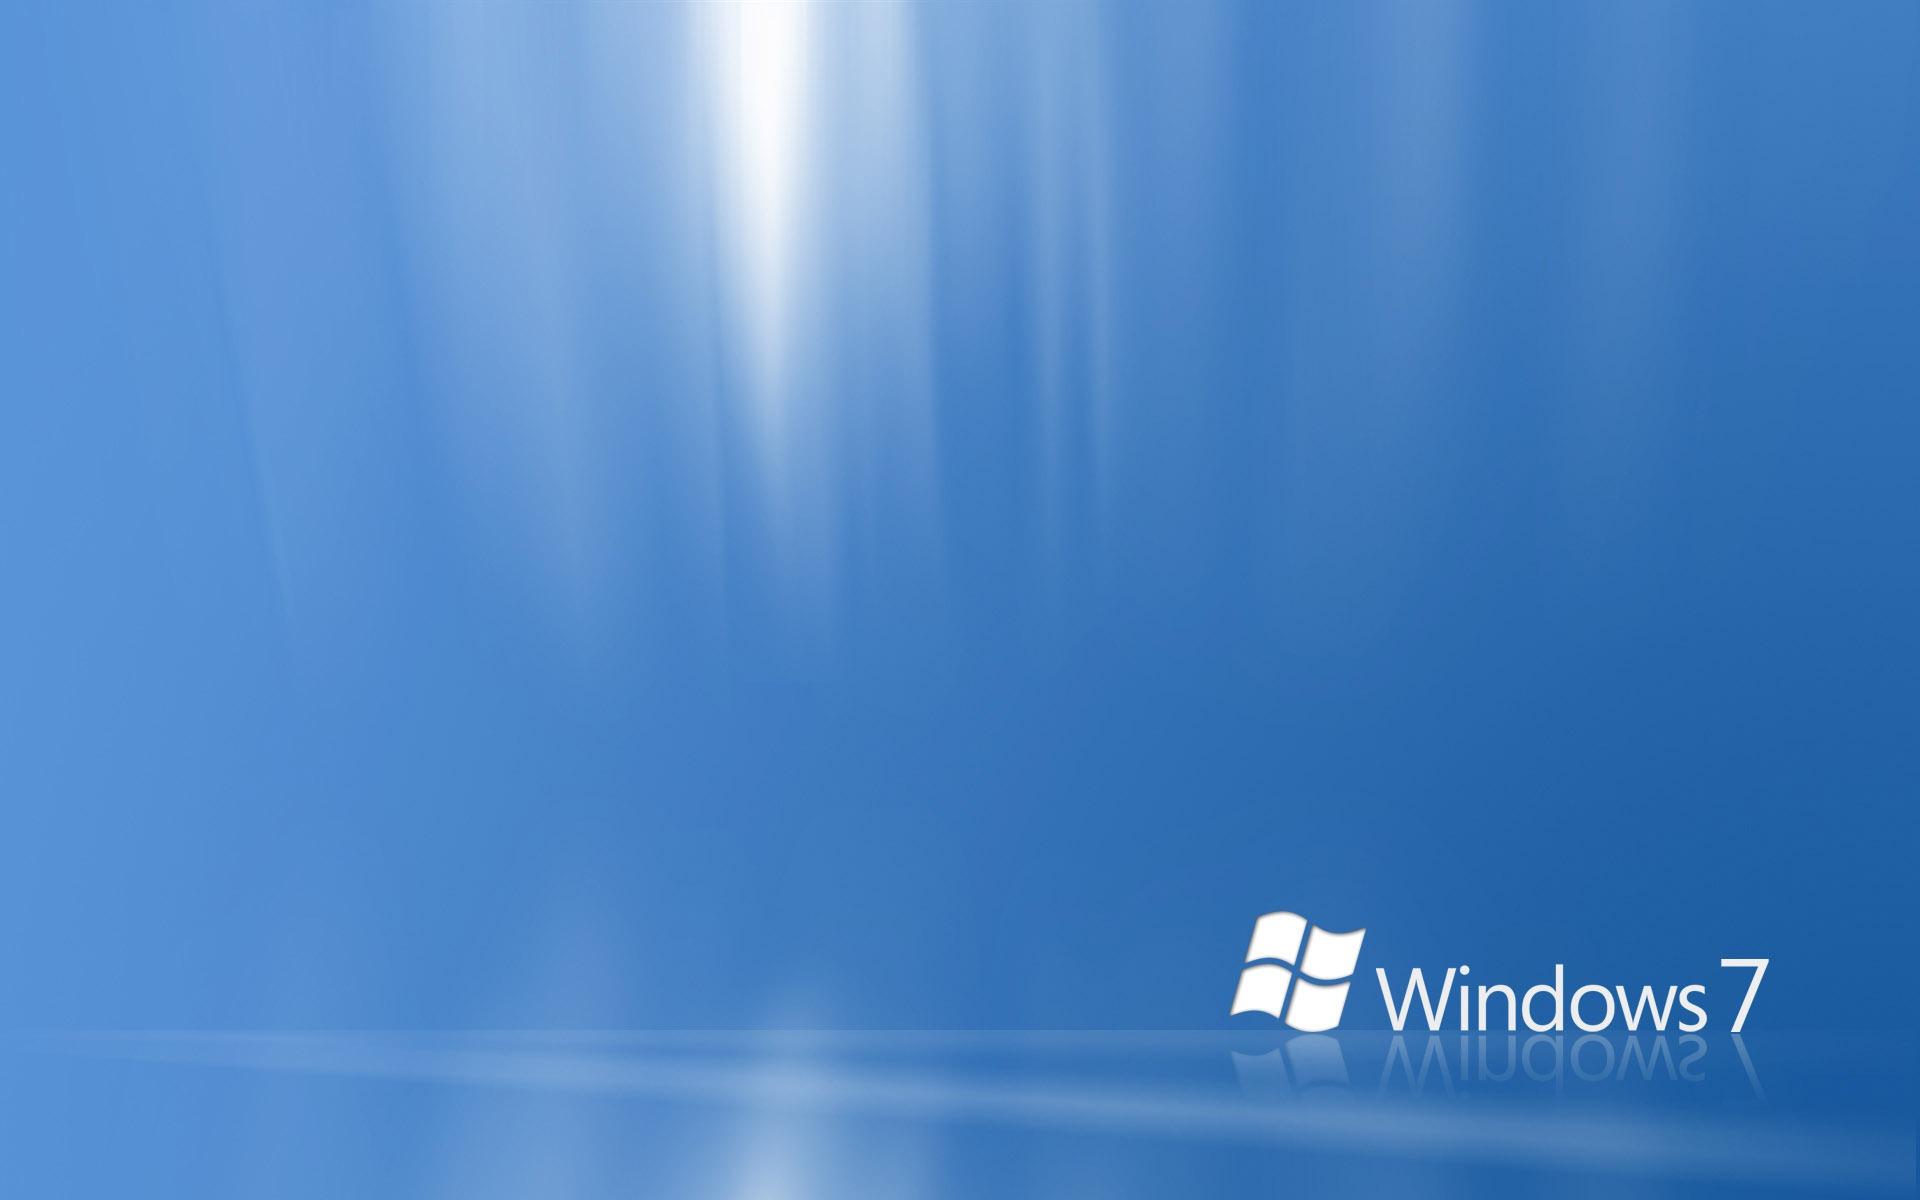 Windows7のテーマの壁紙 2 23 19x10 壁紙ダウンロード Windows7のテーマの壁紙 2 システム 壁紙 V3の壁紙